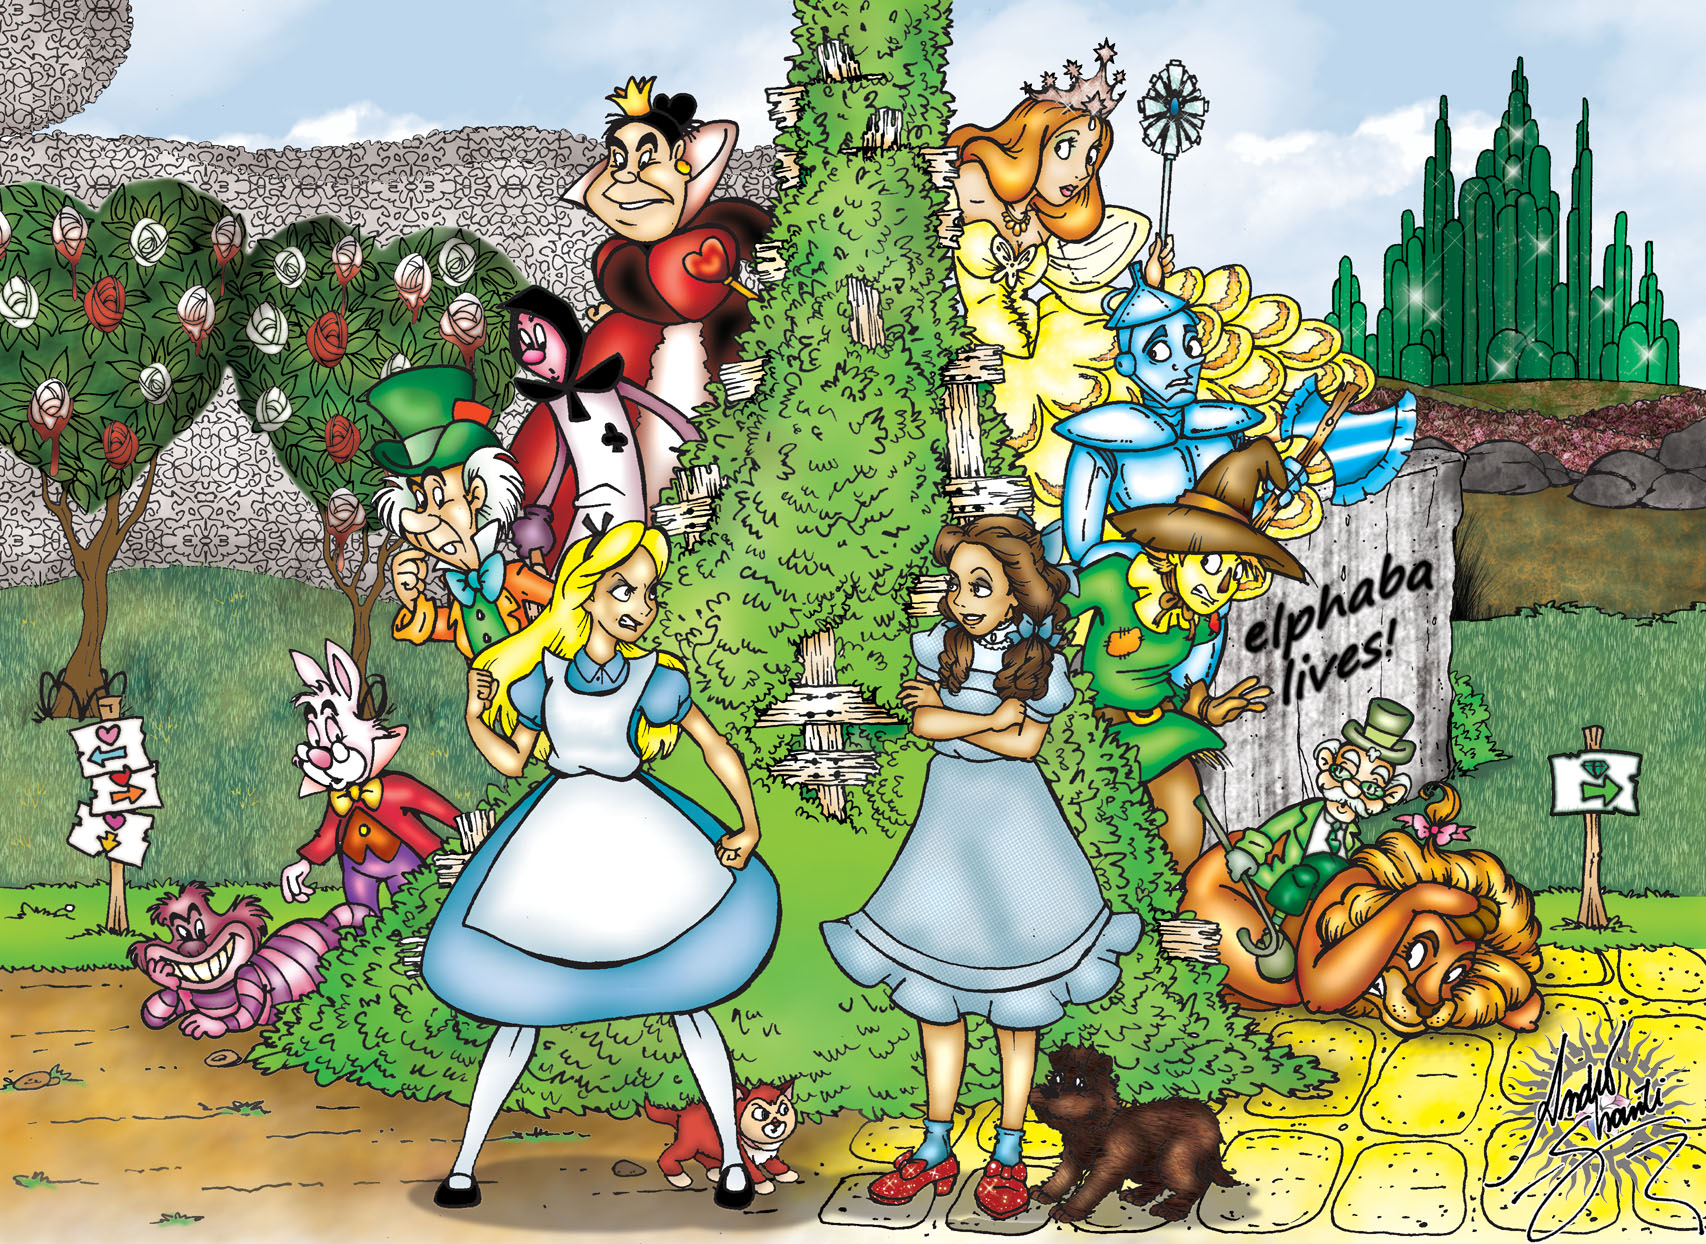 Le Monde Fantastique d'Oz [Disney - 2013] - Page 10 Alice_versus_dorothy_by_andreshanti-d37395u